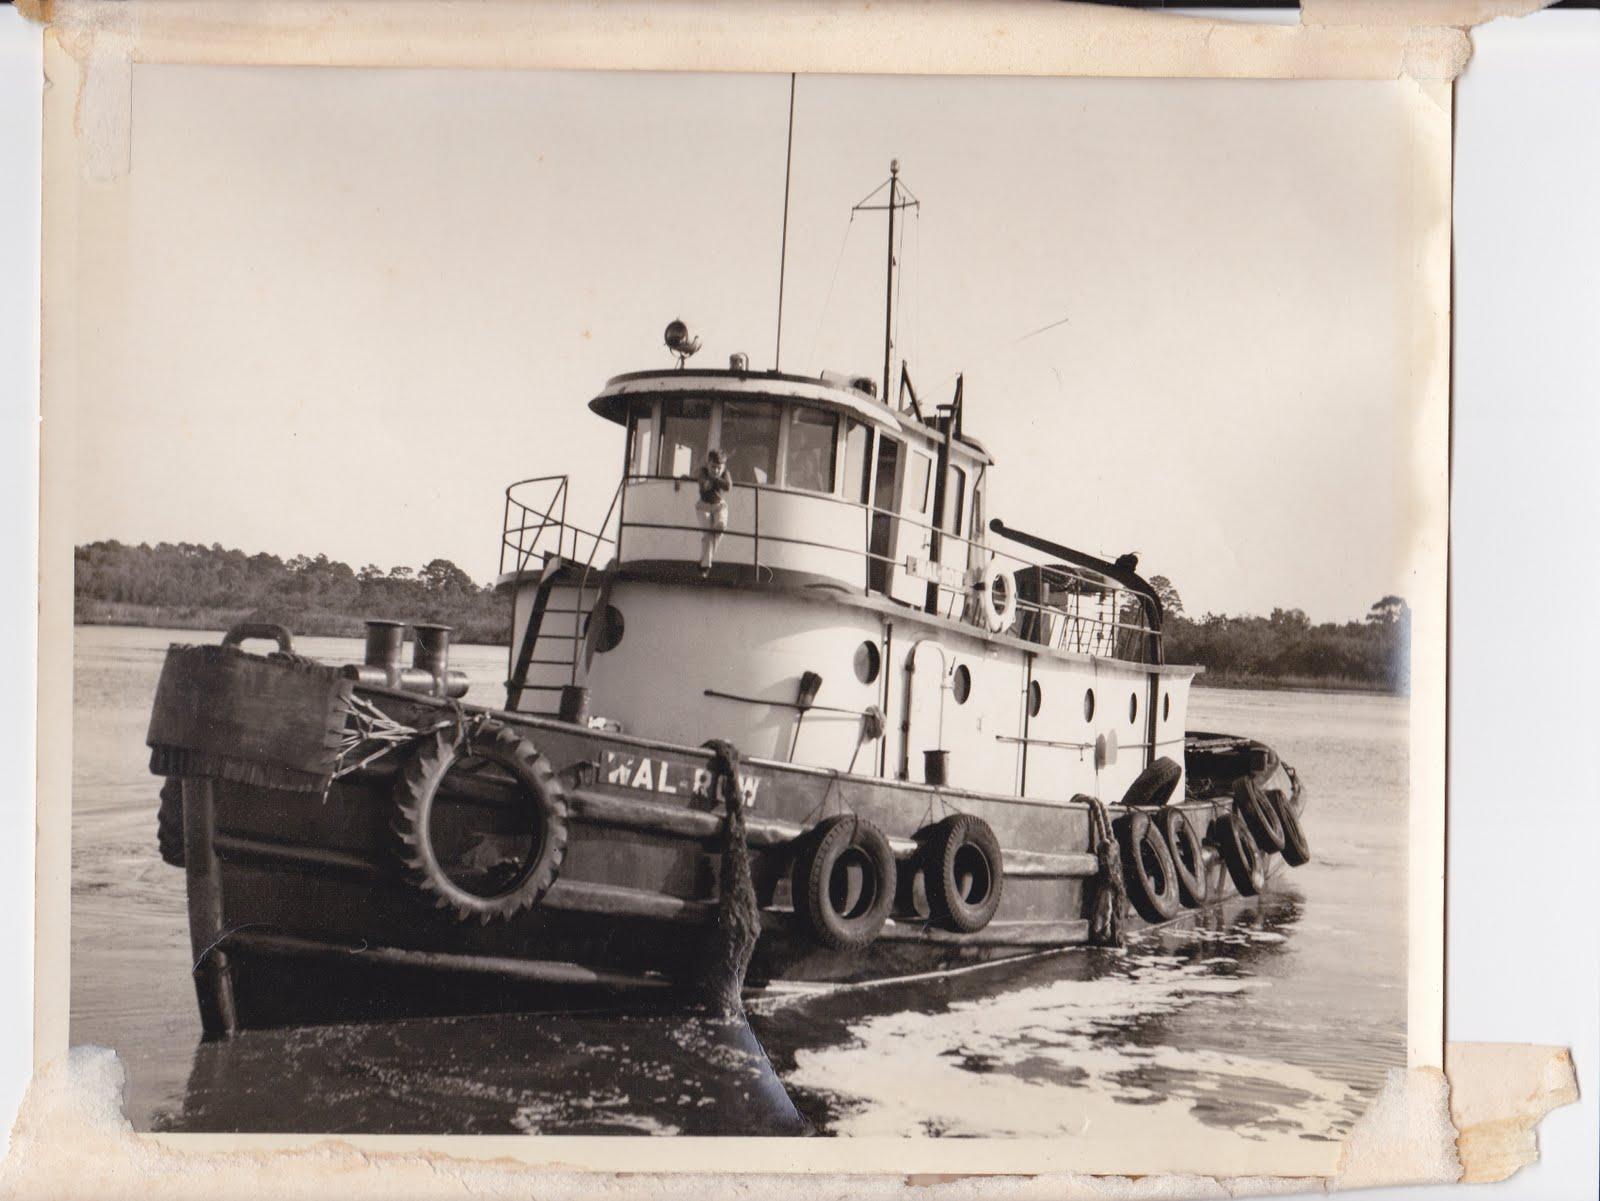 Felsebiyat Dergisi – Popular Tugboat Captain Salary